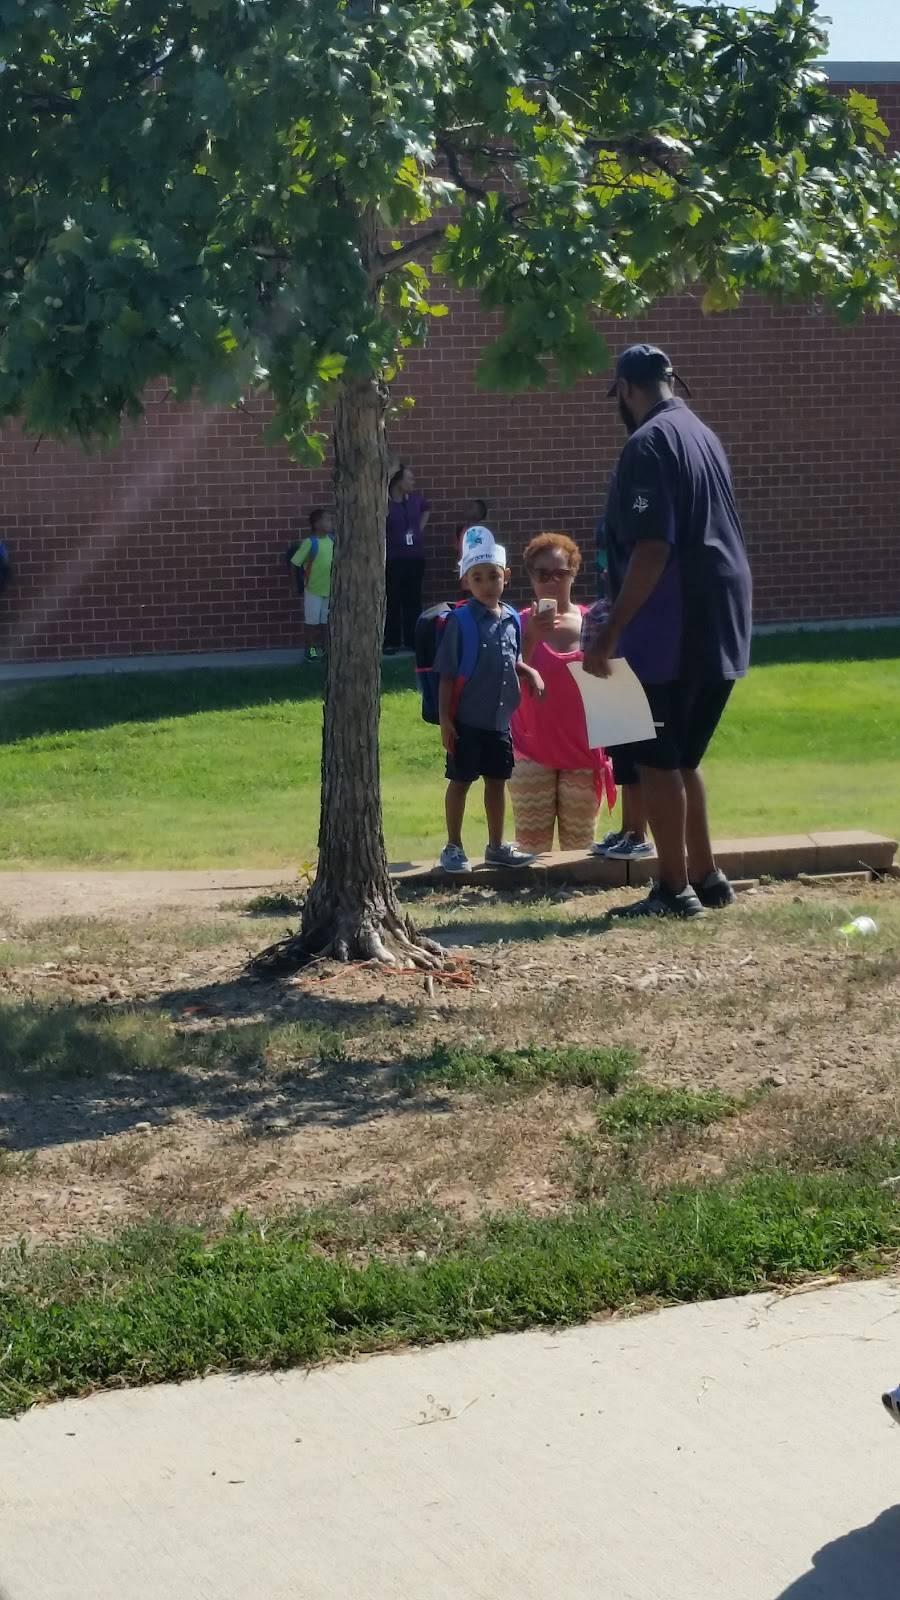 Lynette Woodard Park - park    Photo 8 of 9   Address: 2750 E 18th St N, Wichita, KS 67214, USA   Phone: (316) 303-8015